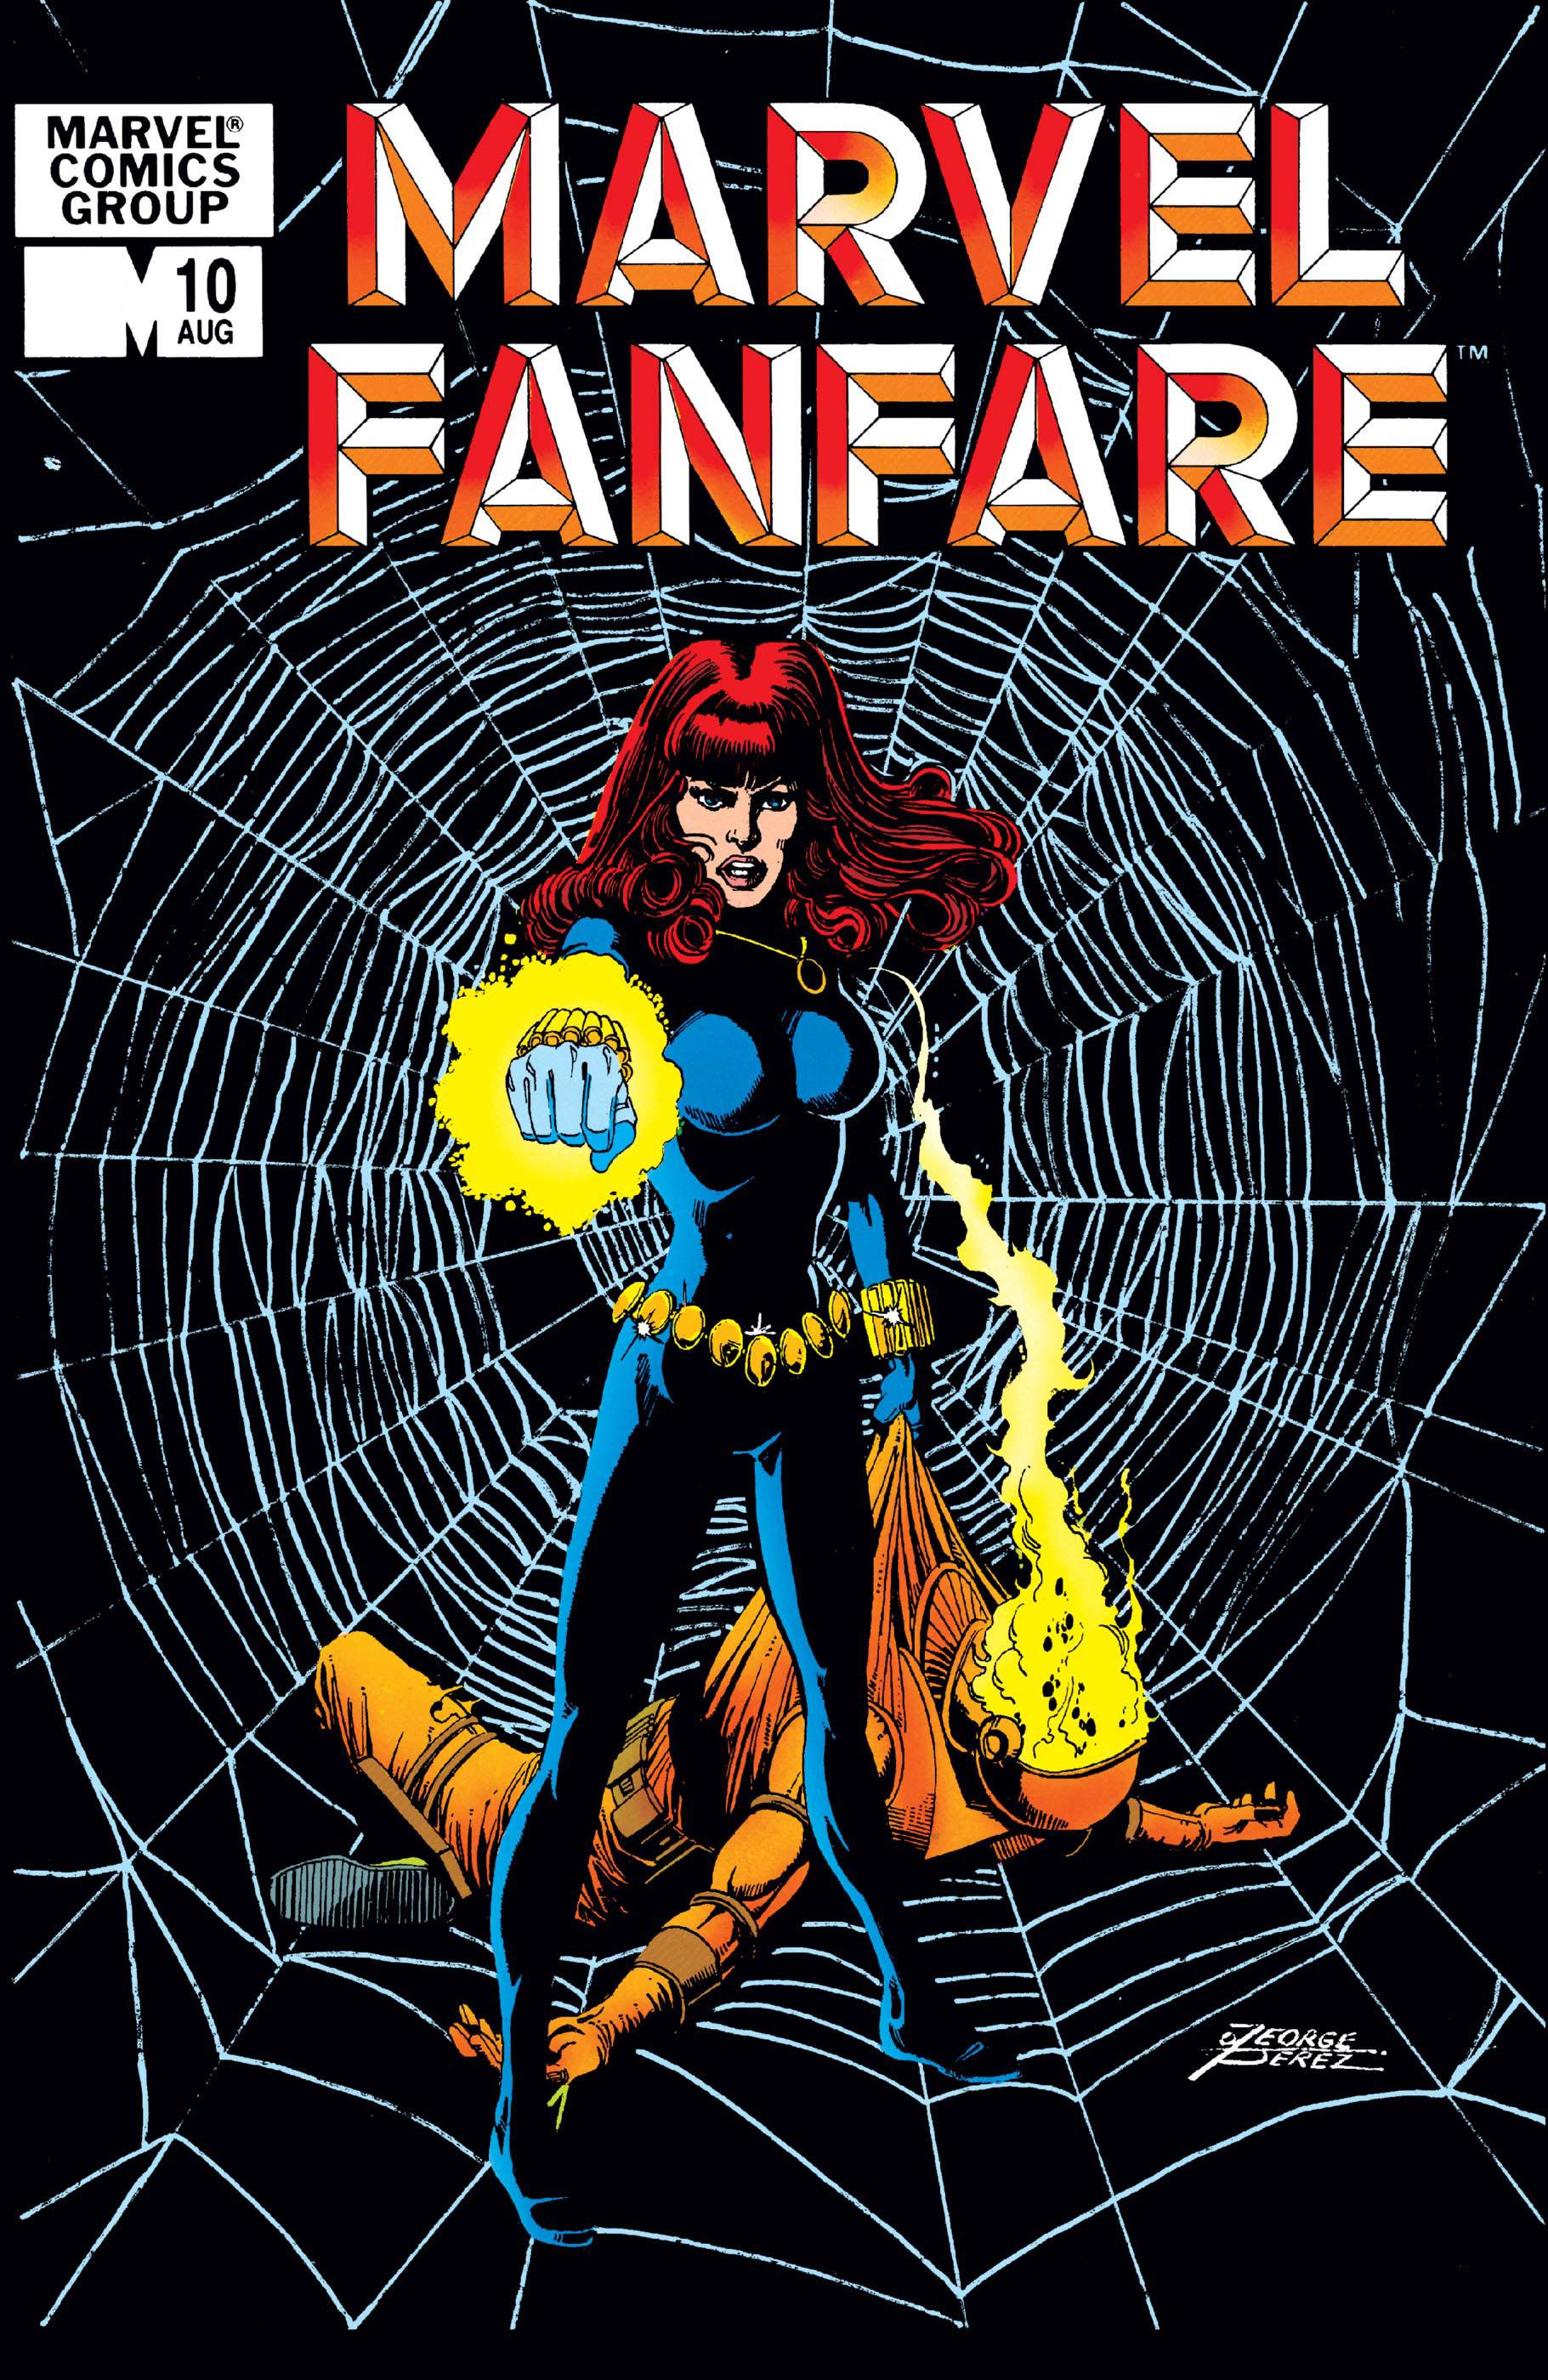 Marvel Fanfare (1982) #10